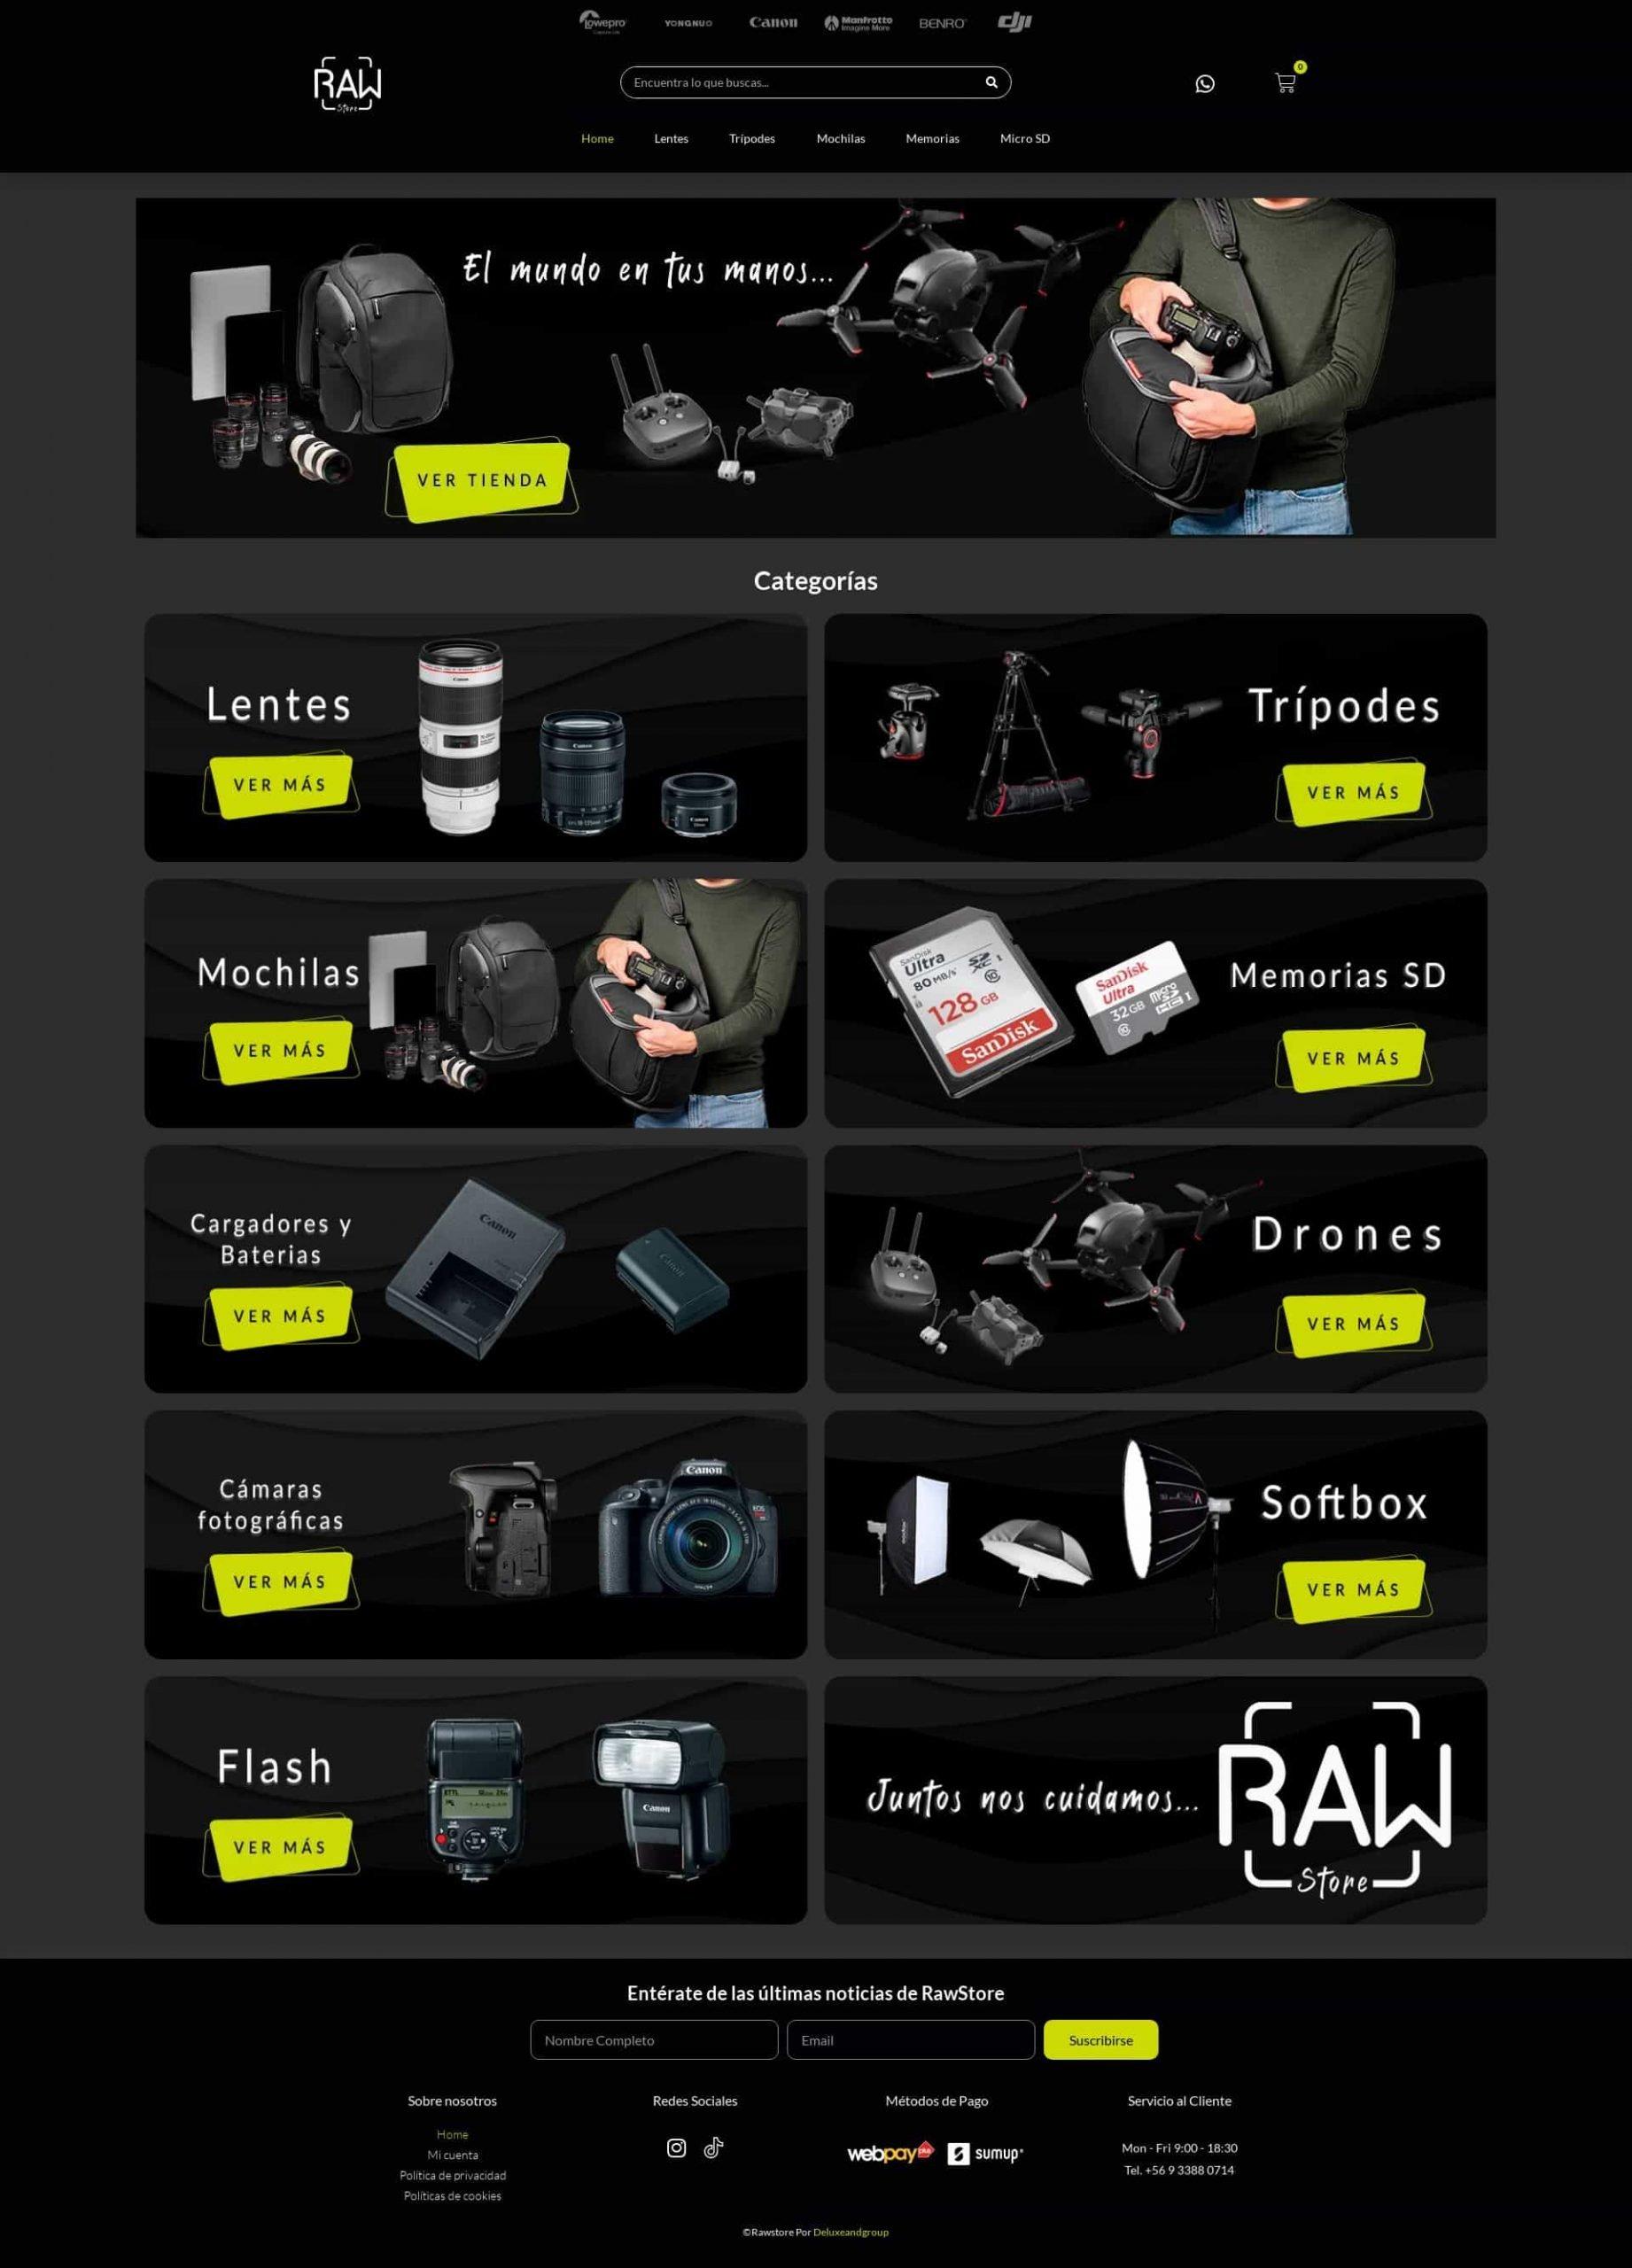 rawstore_cl (1) (1)